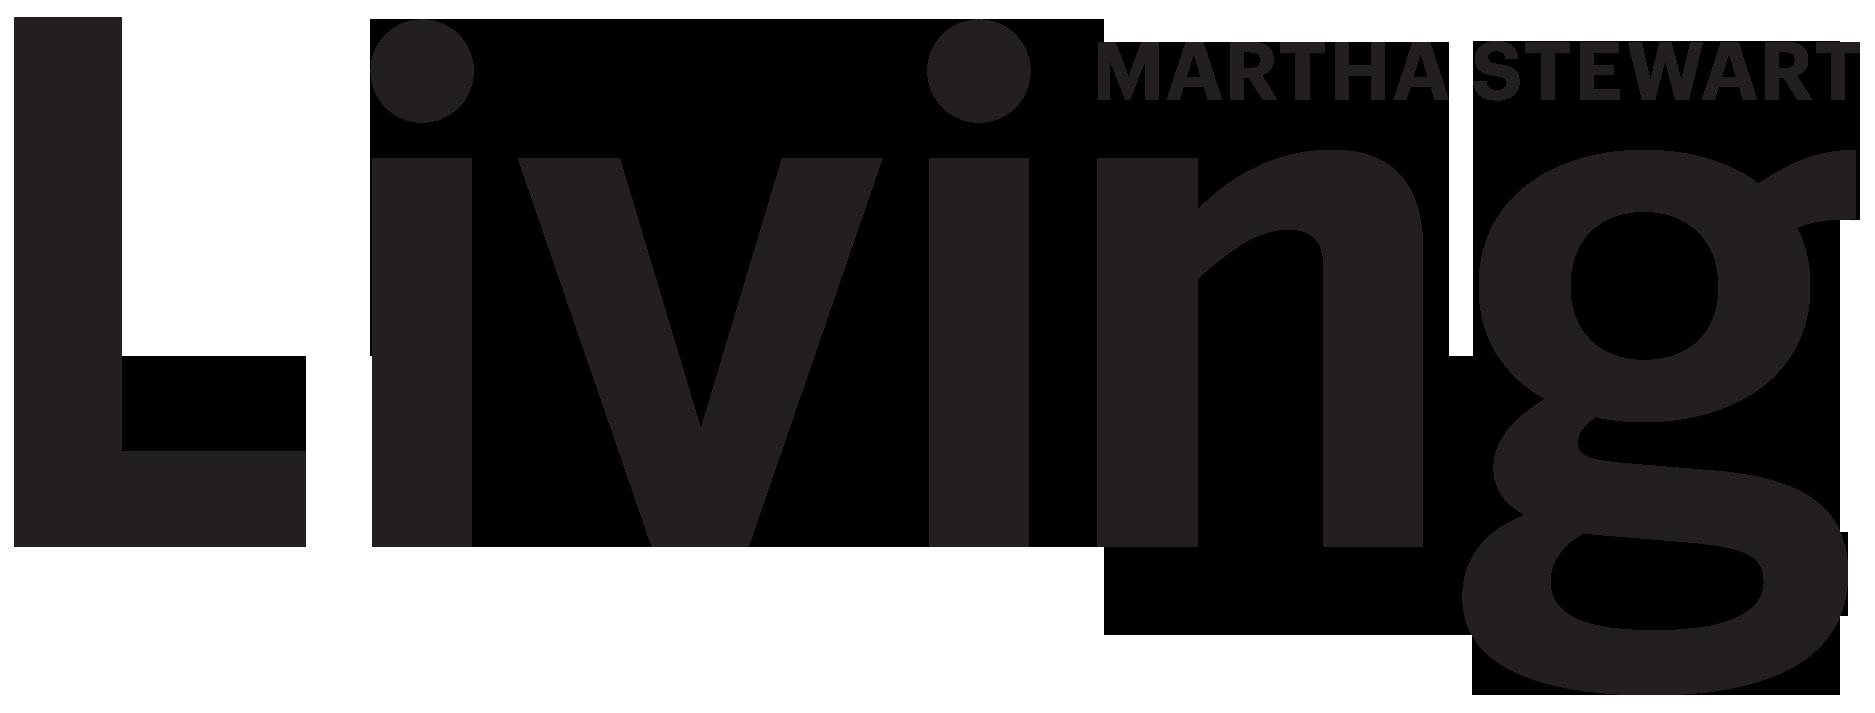 martha-stewart-living-logo.png